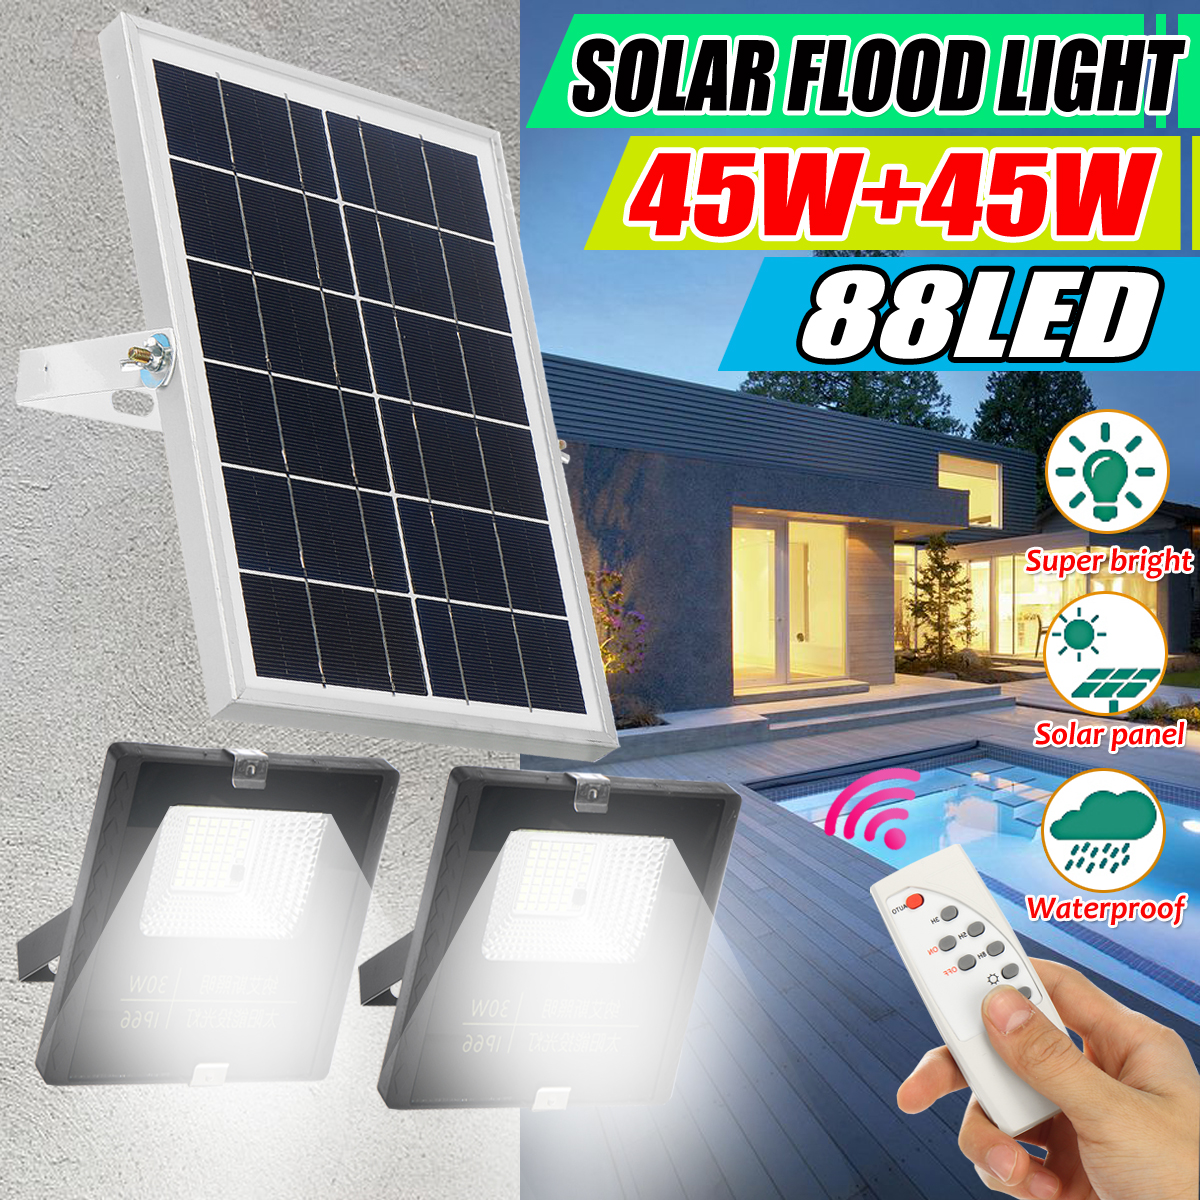 45w+45w Solar Floodlight Led Portable Spotlight Floodlight Outdoor Street Garden Light Waterproof Wall Lamp With Remote Control